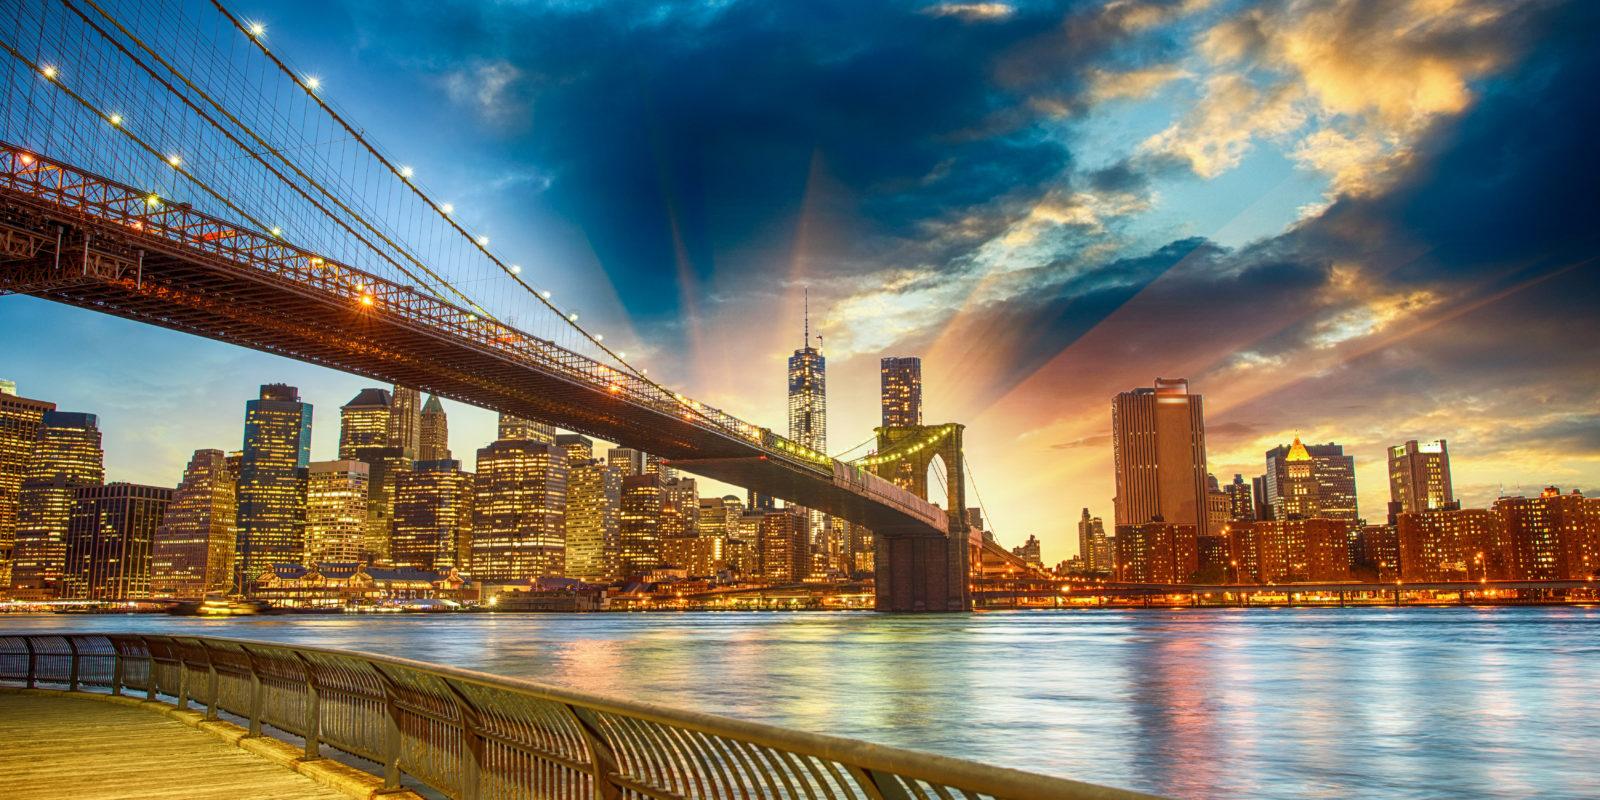 New York Benyond Manhattan